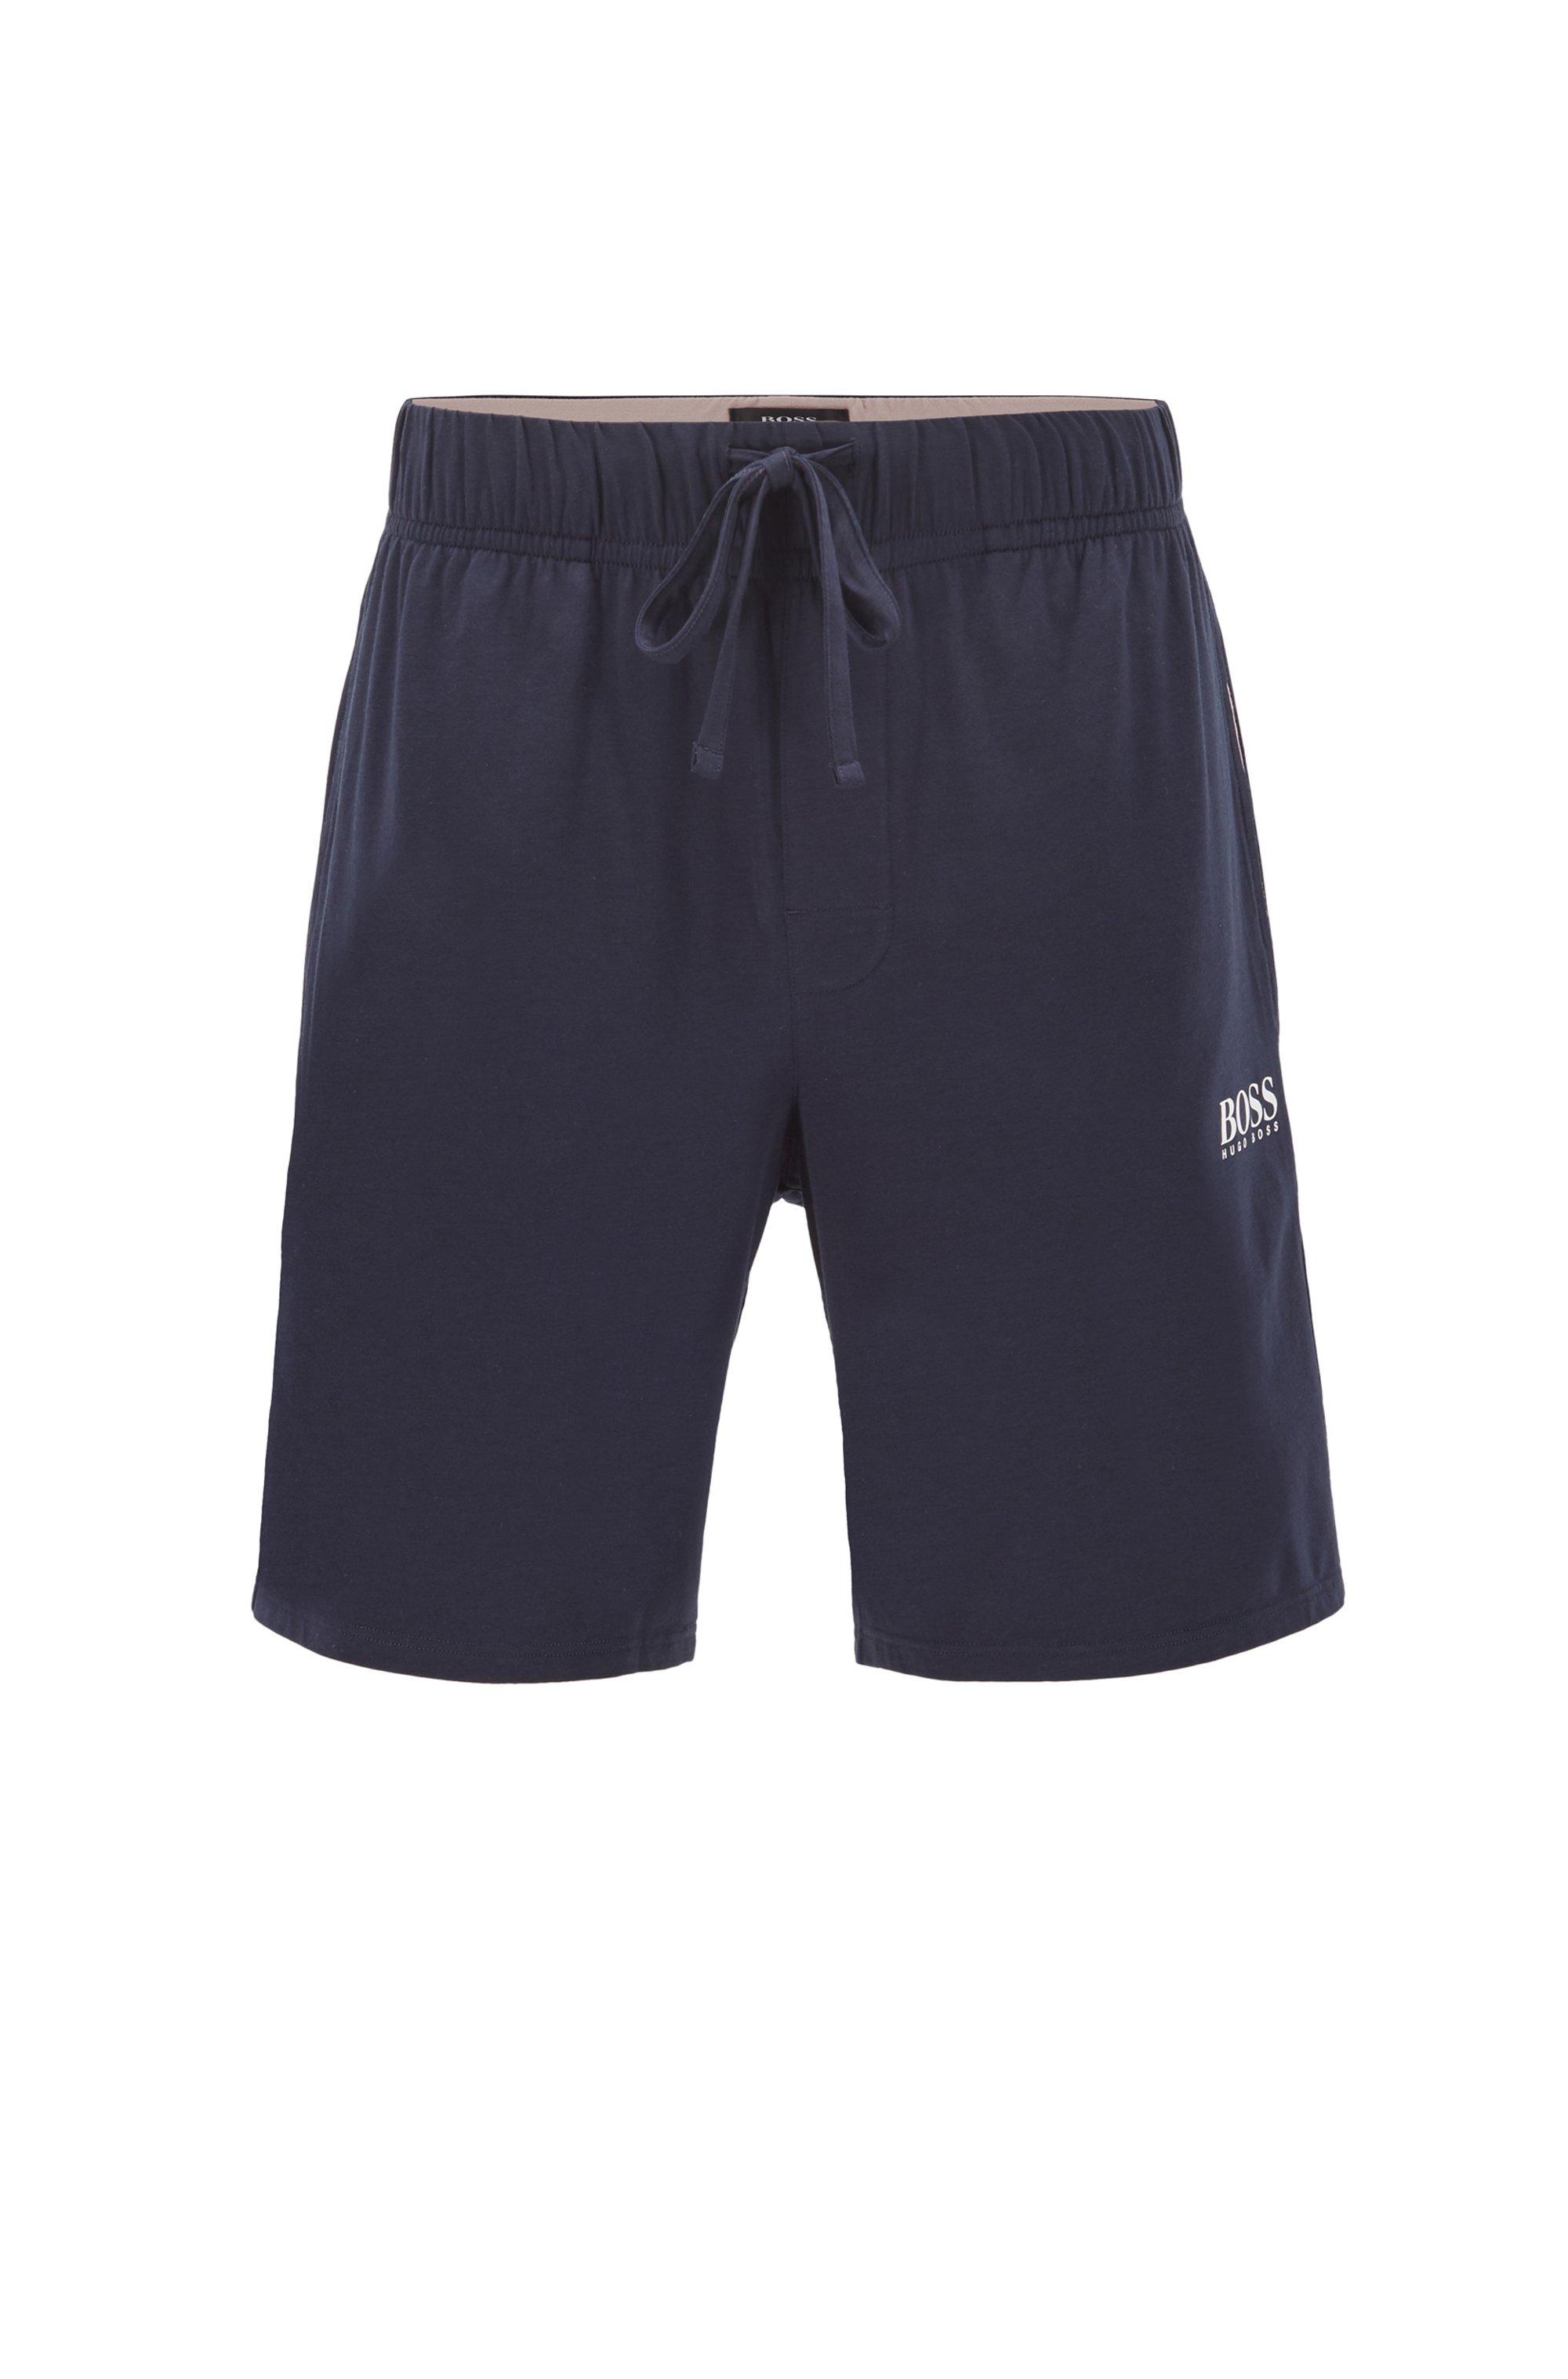 Pyjama-Shorts aus Pima-Baumwoll-Mix mit Logo, Dunkelblau